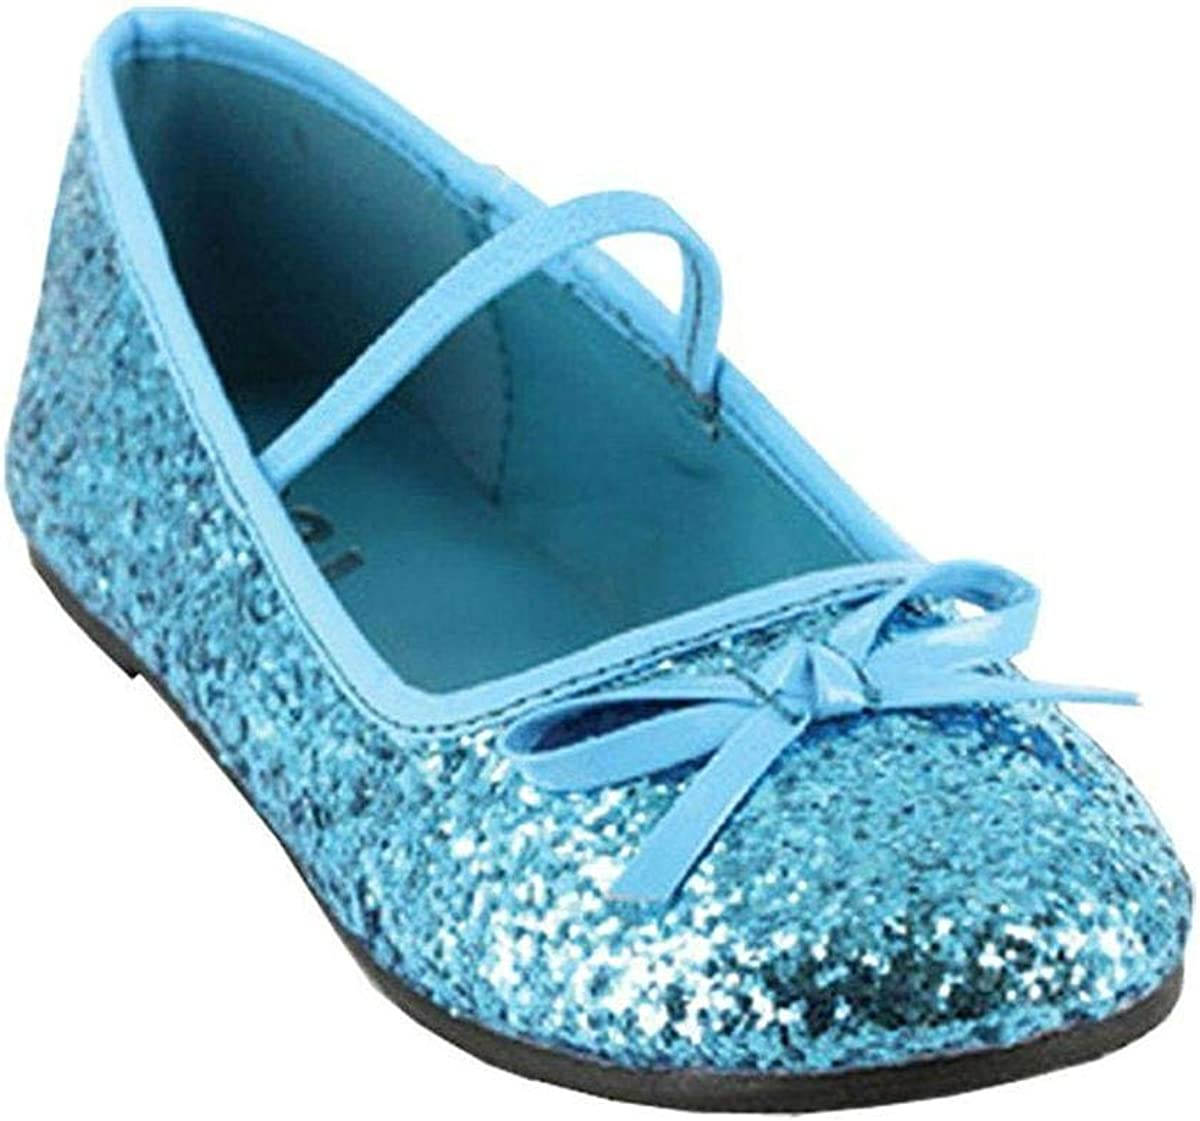 Ellie Shoes Flat Ballet Glitter Ch Bu Med